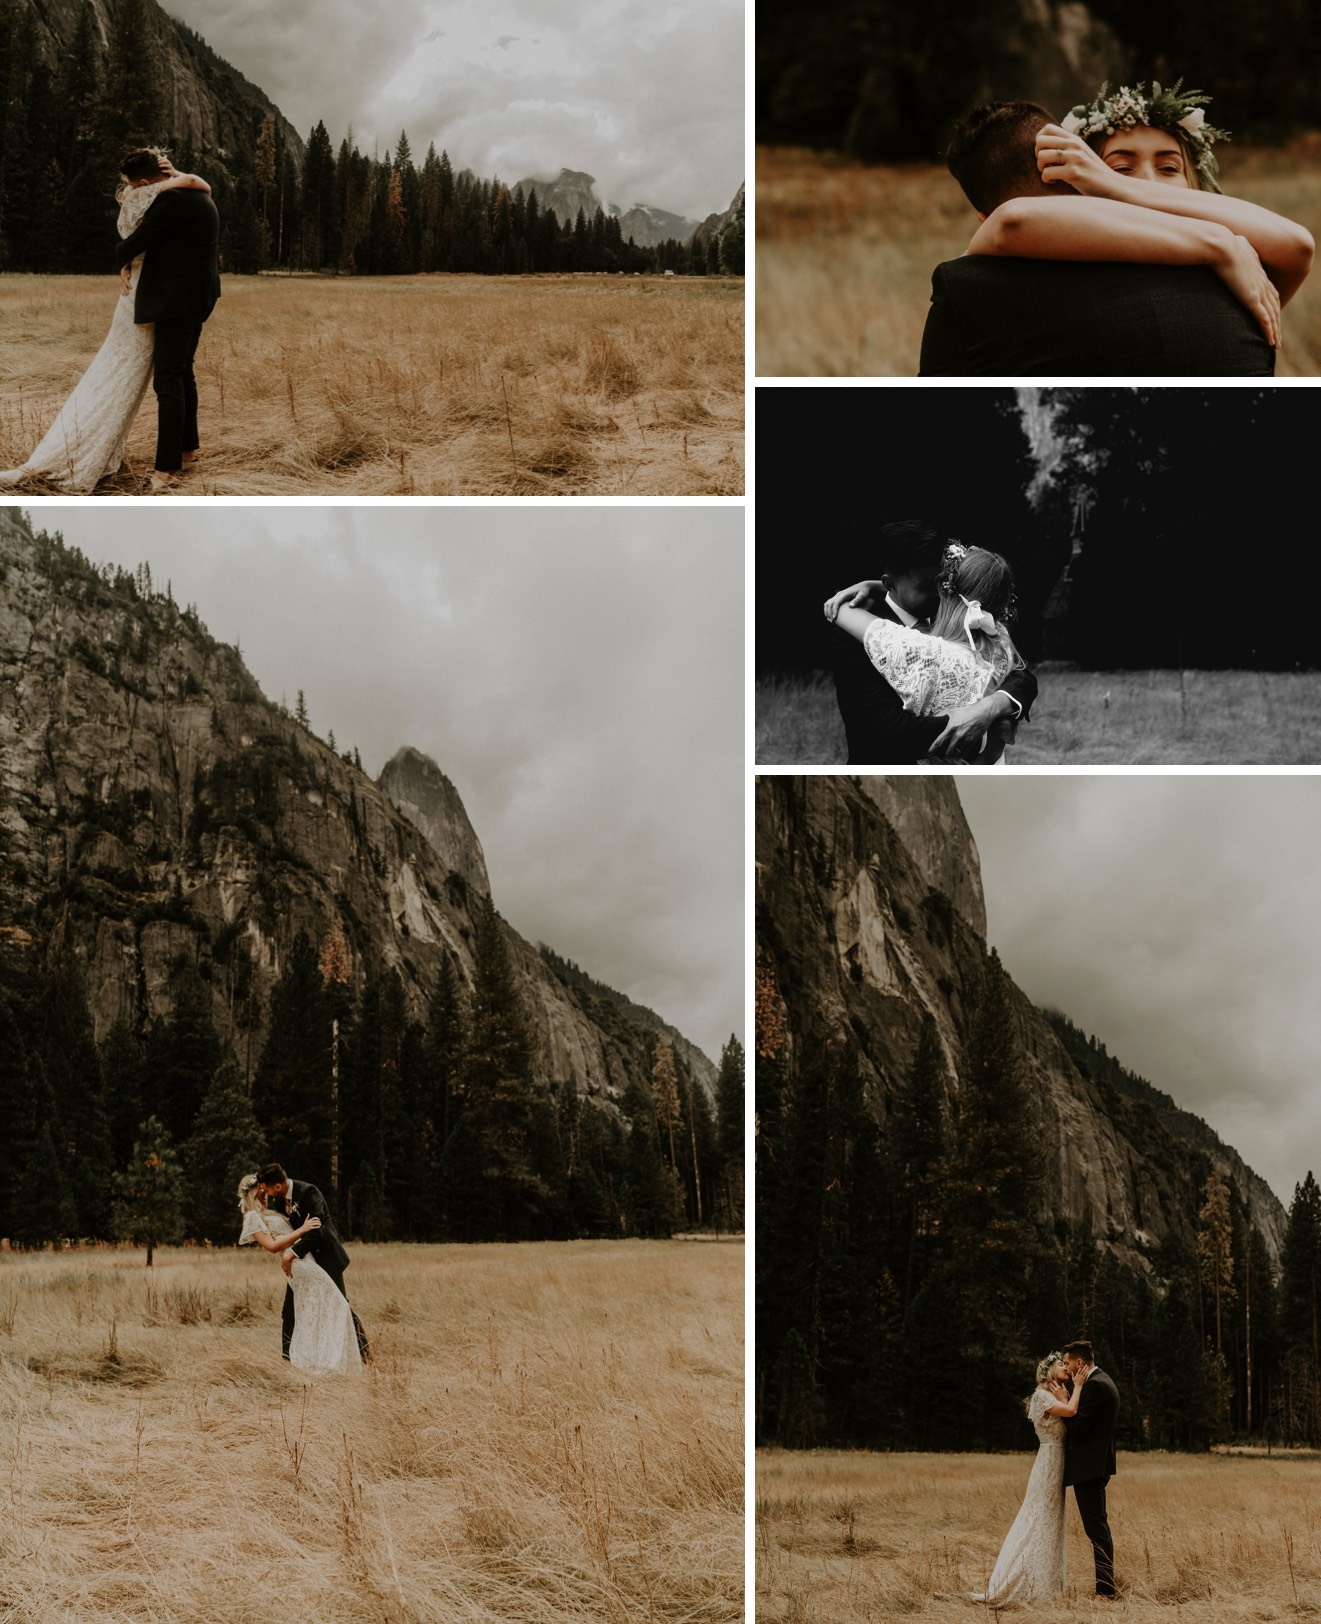 yosemite_wedding_photographer6.jpg